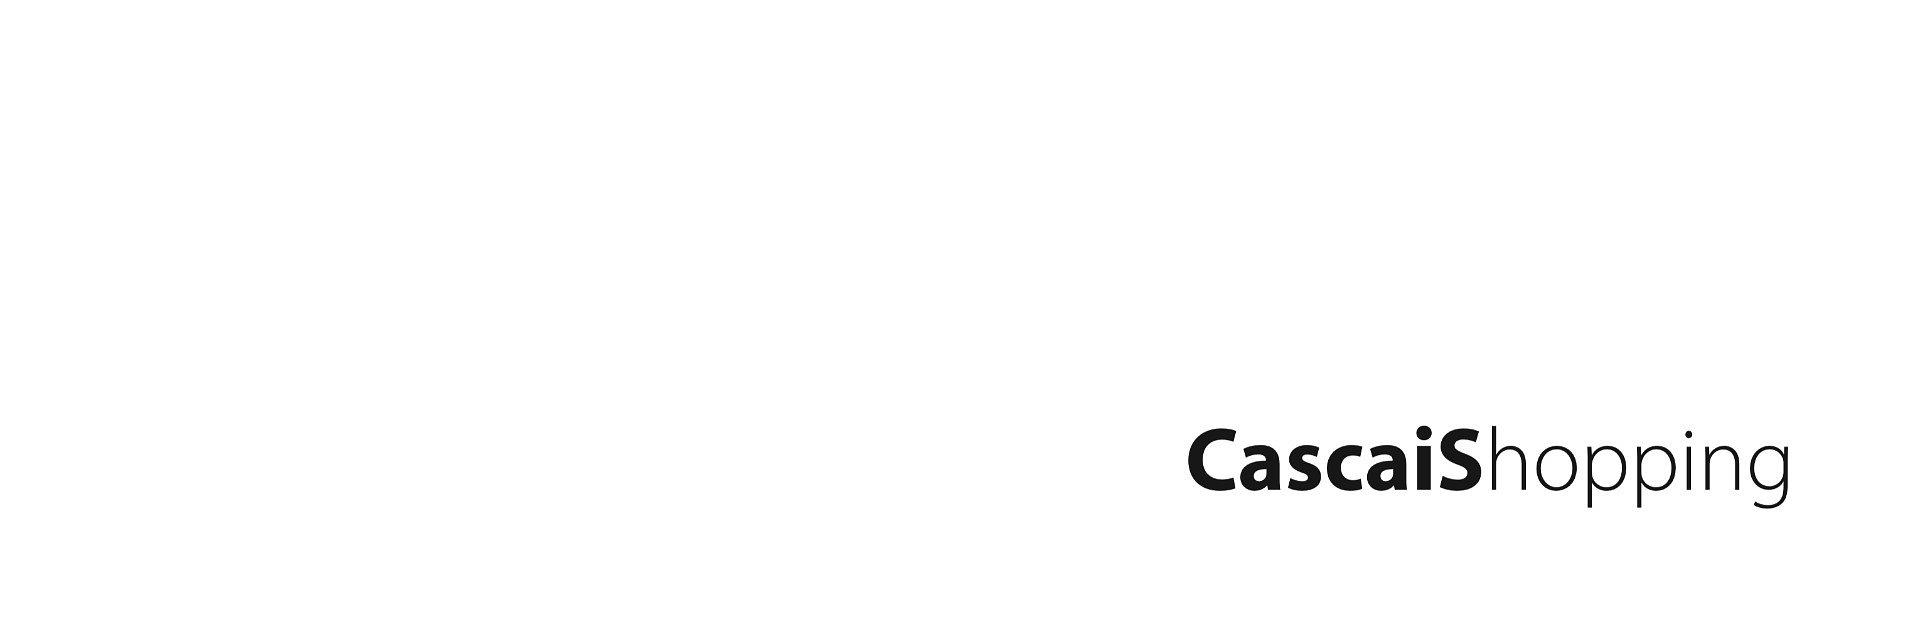 CascaiShopping implementou medidas adicionais para garantir segurança de visitantes, lojistas, prestadores de serviços e colaboradores